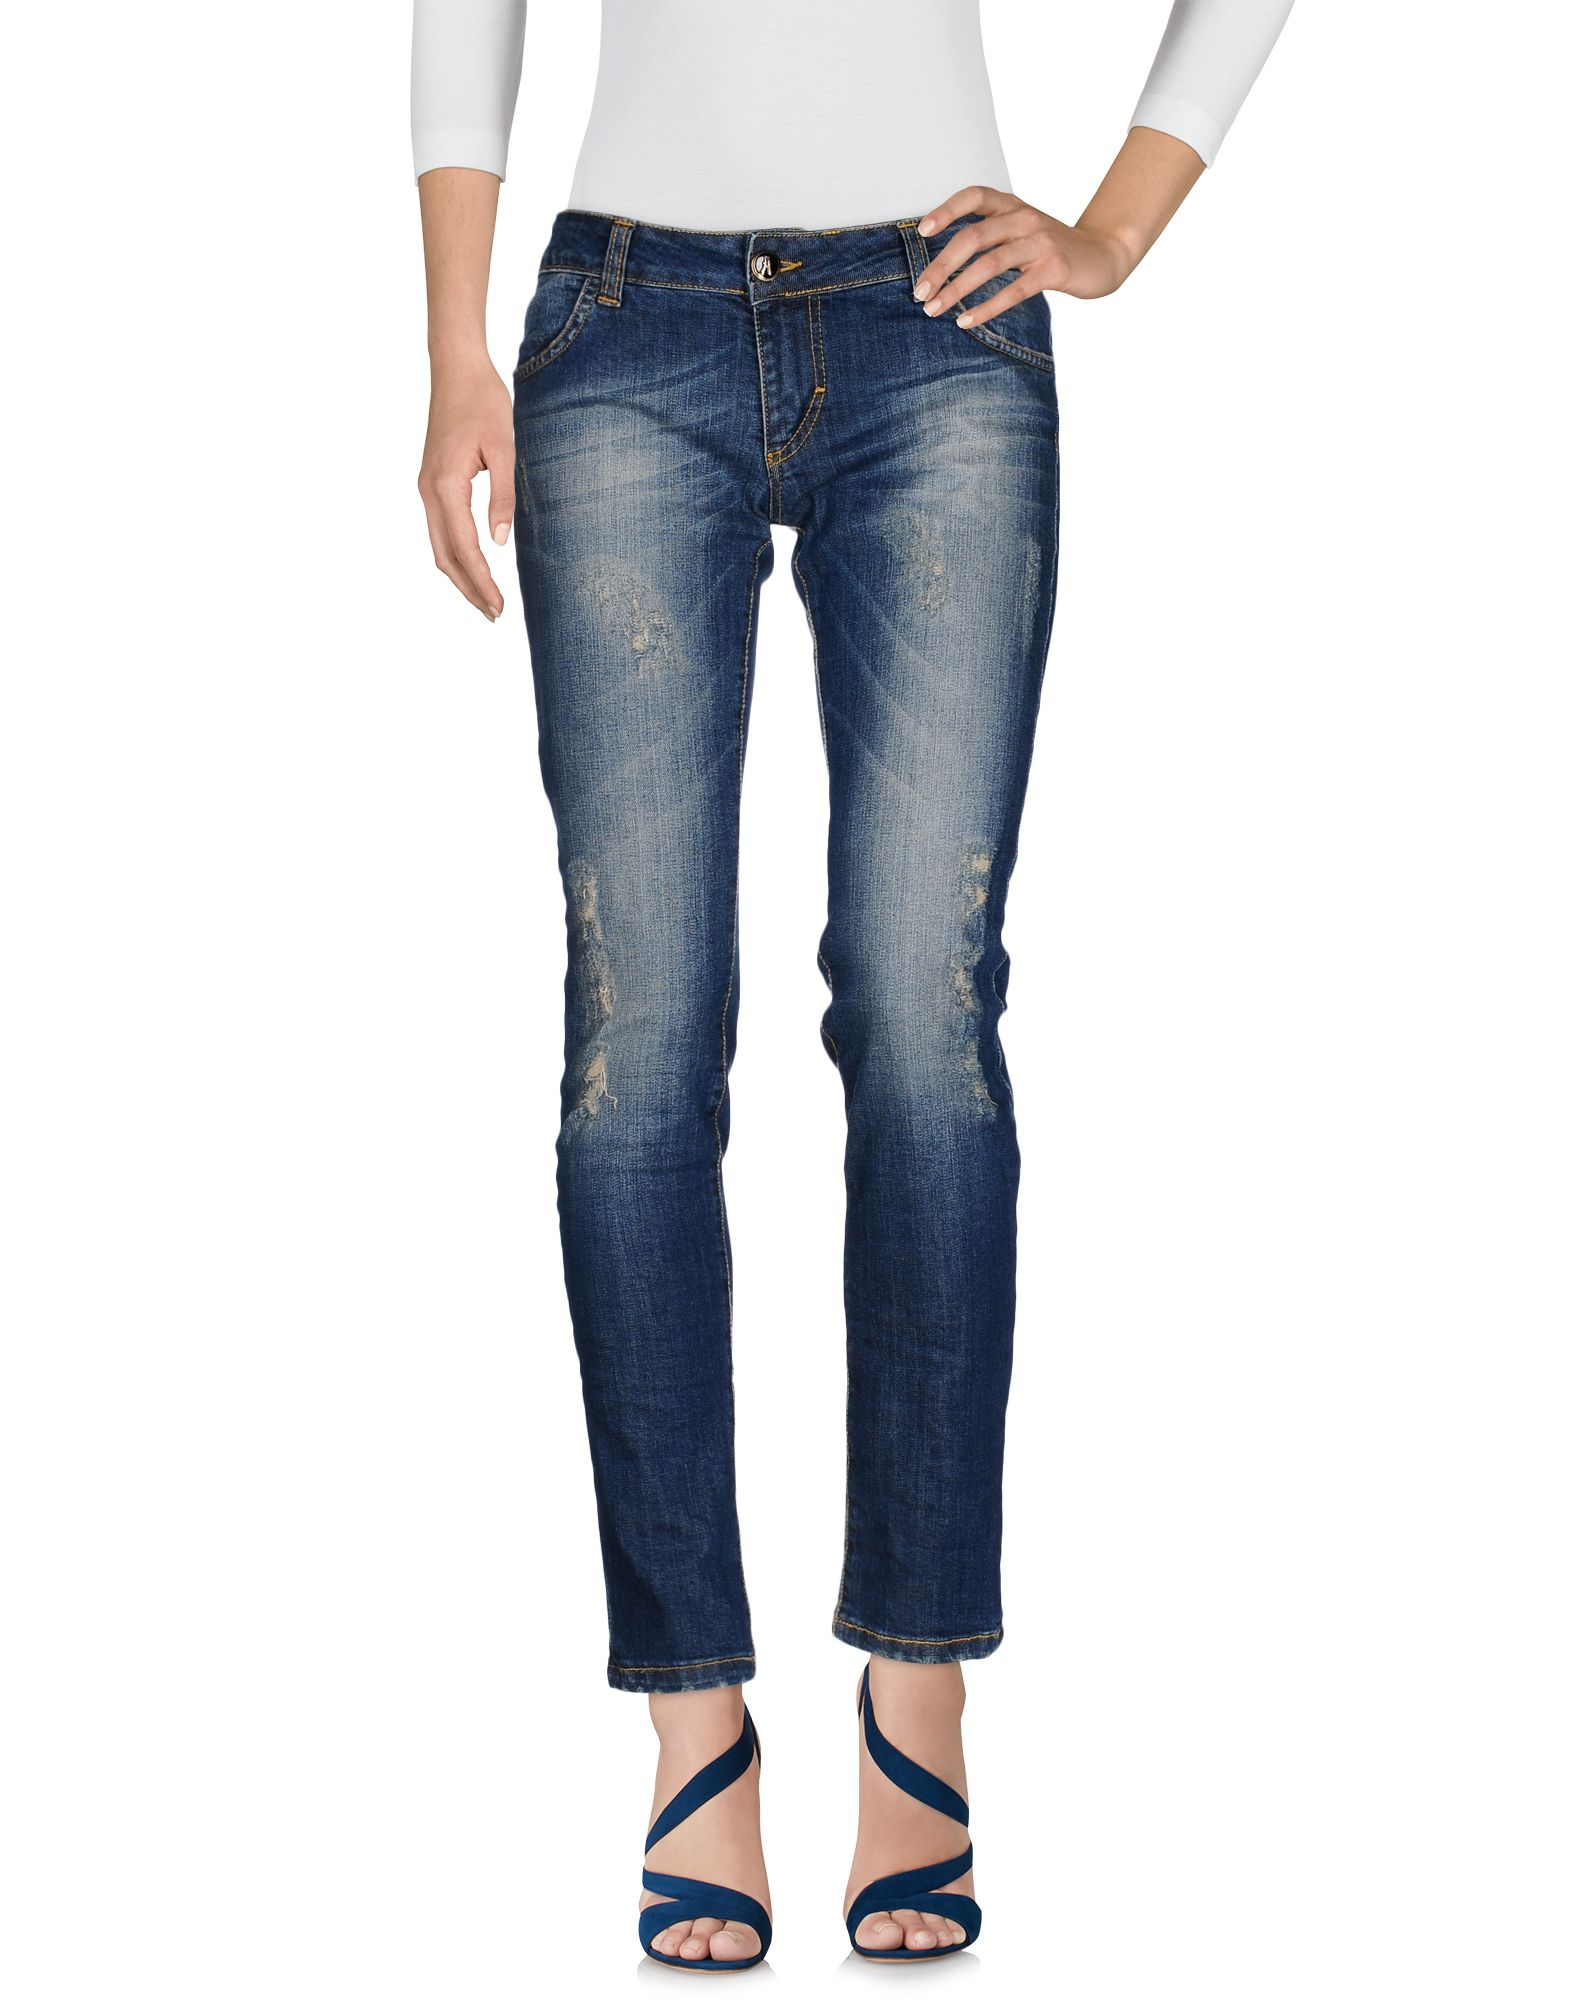 ANIYE BY Damen Jeanshose Farbe Blau Größe 7